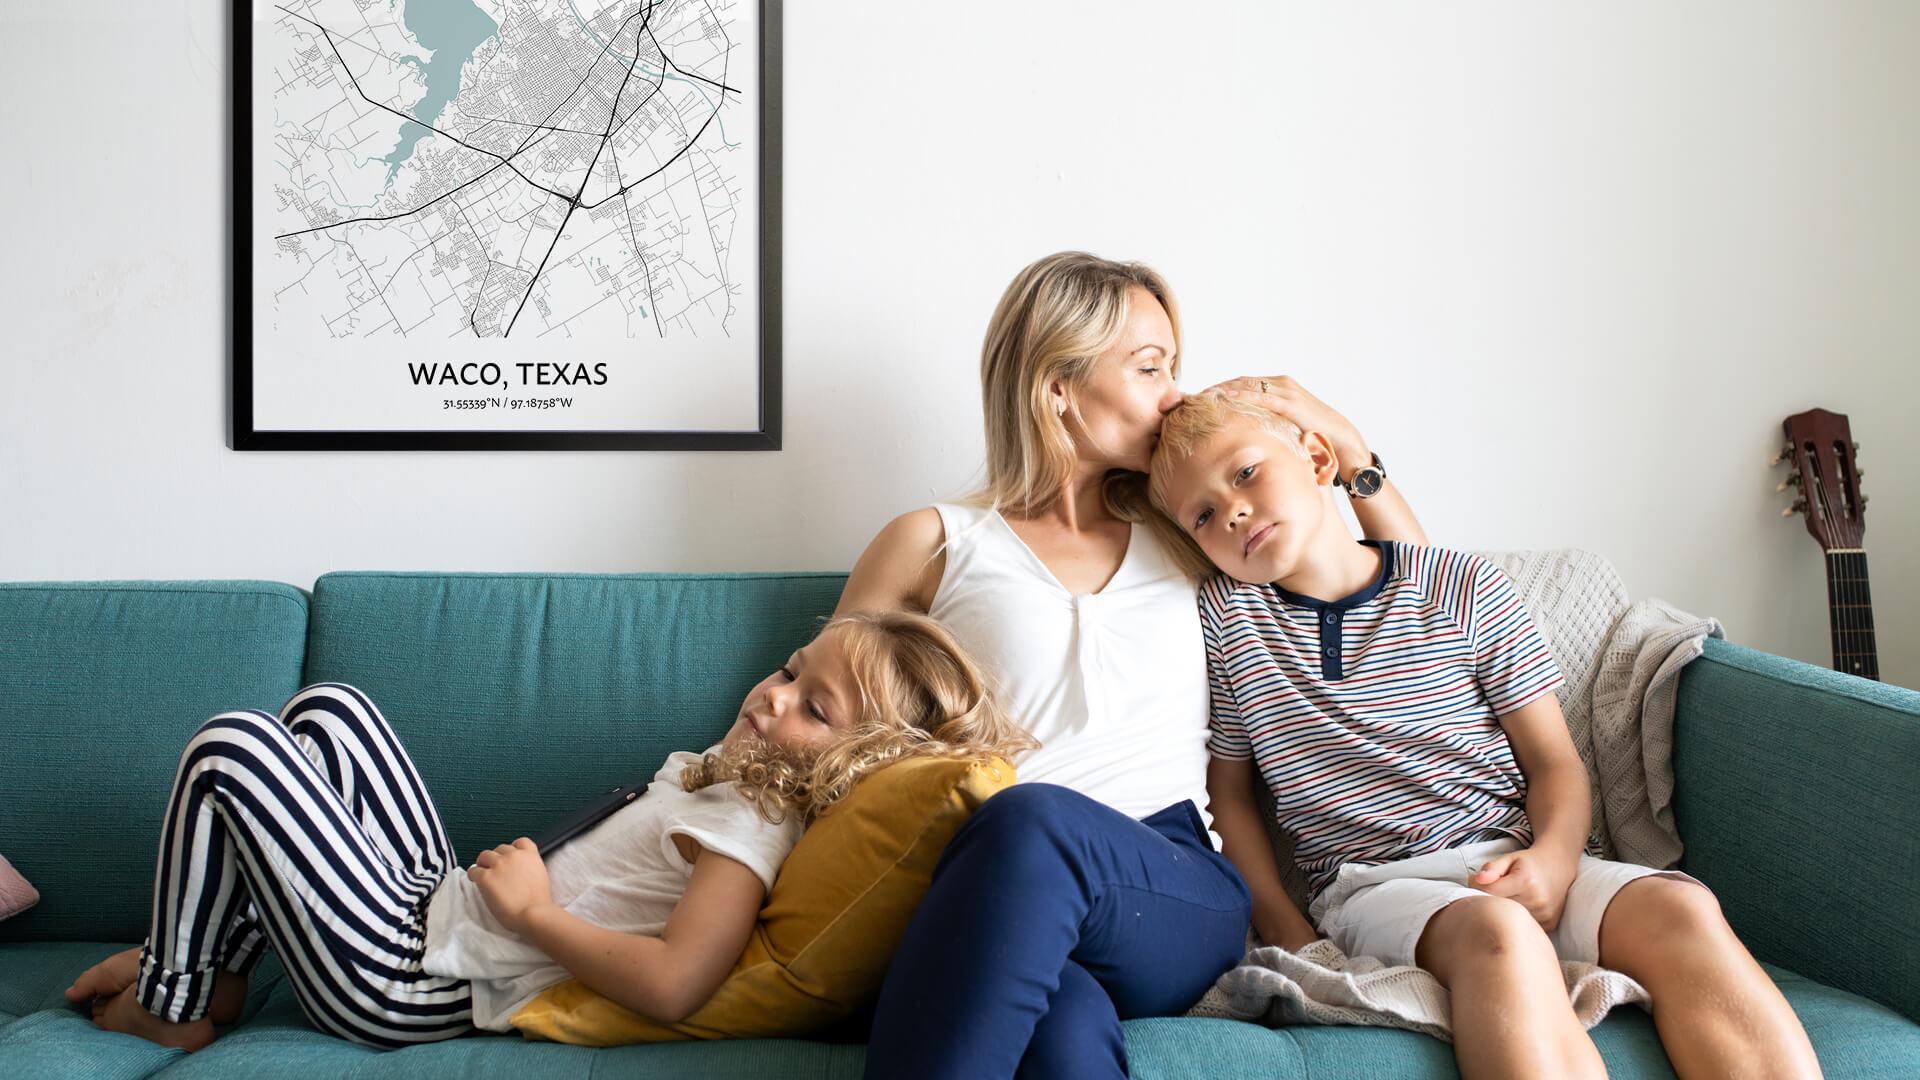 Waco map poster